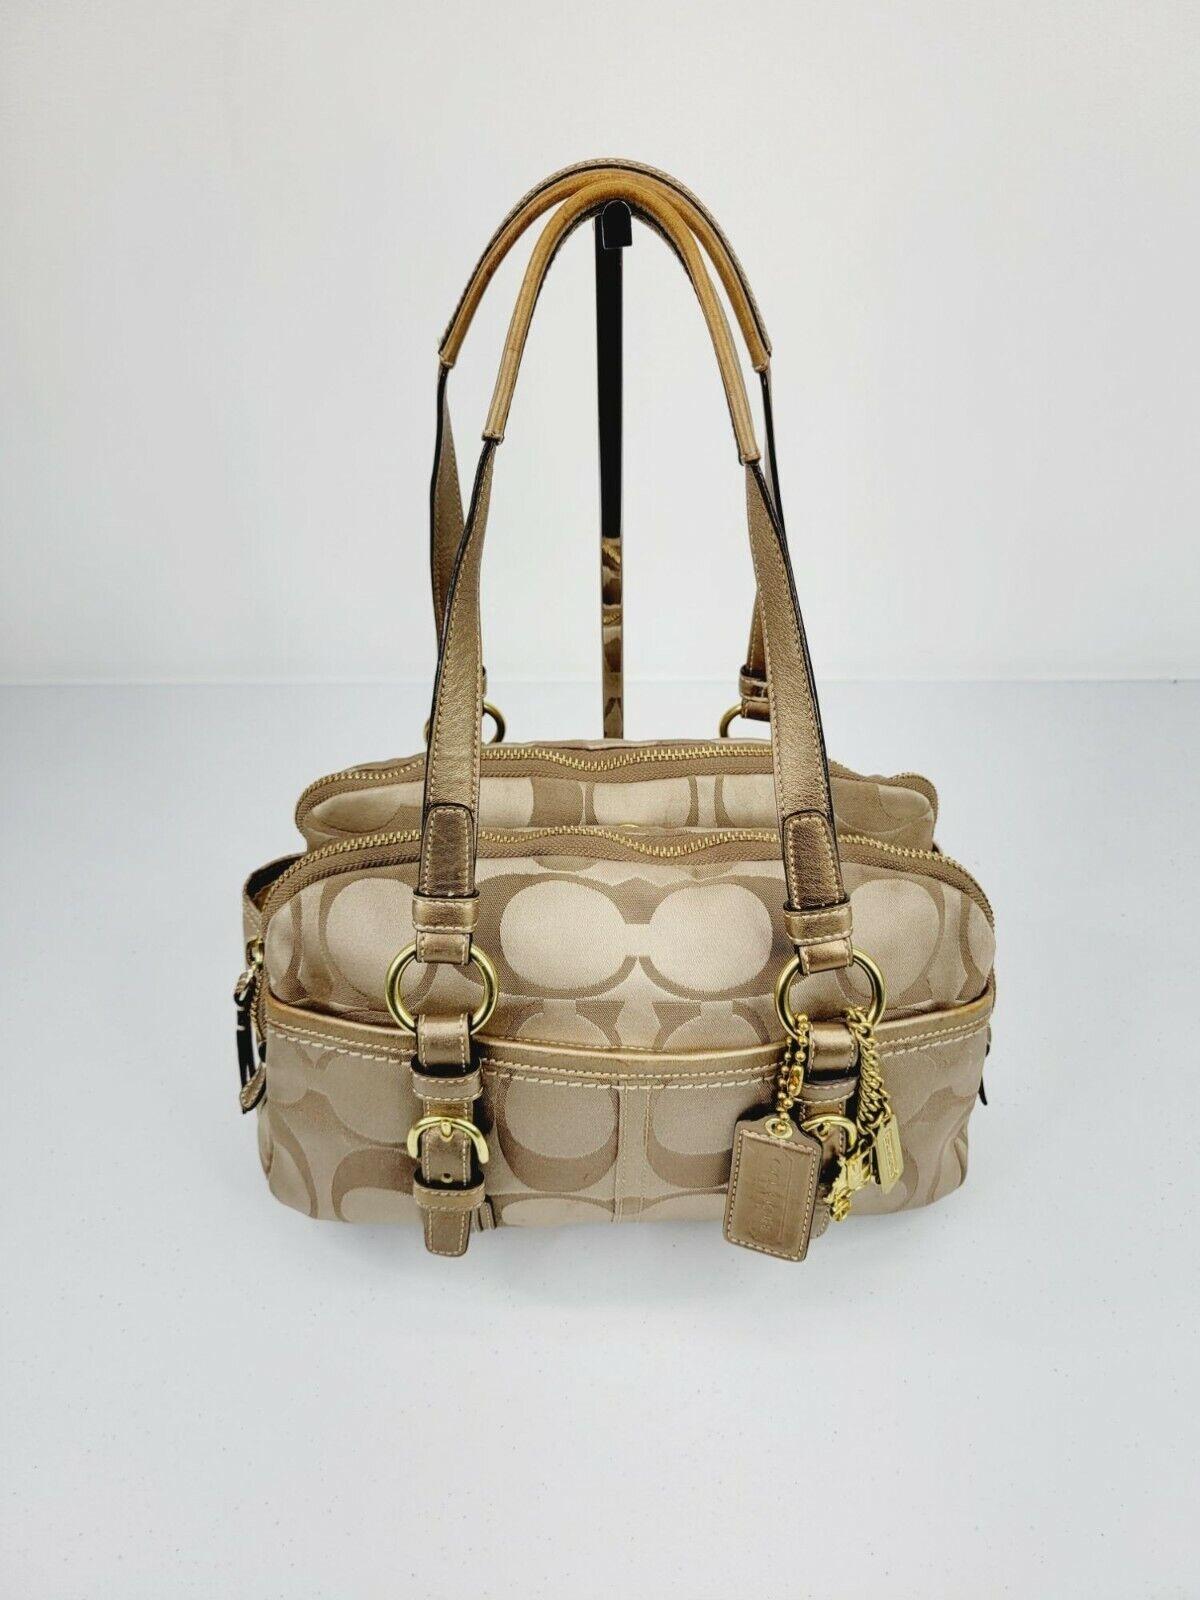 Coach Bonnie Soho Signature Shoulder Bag - image 1